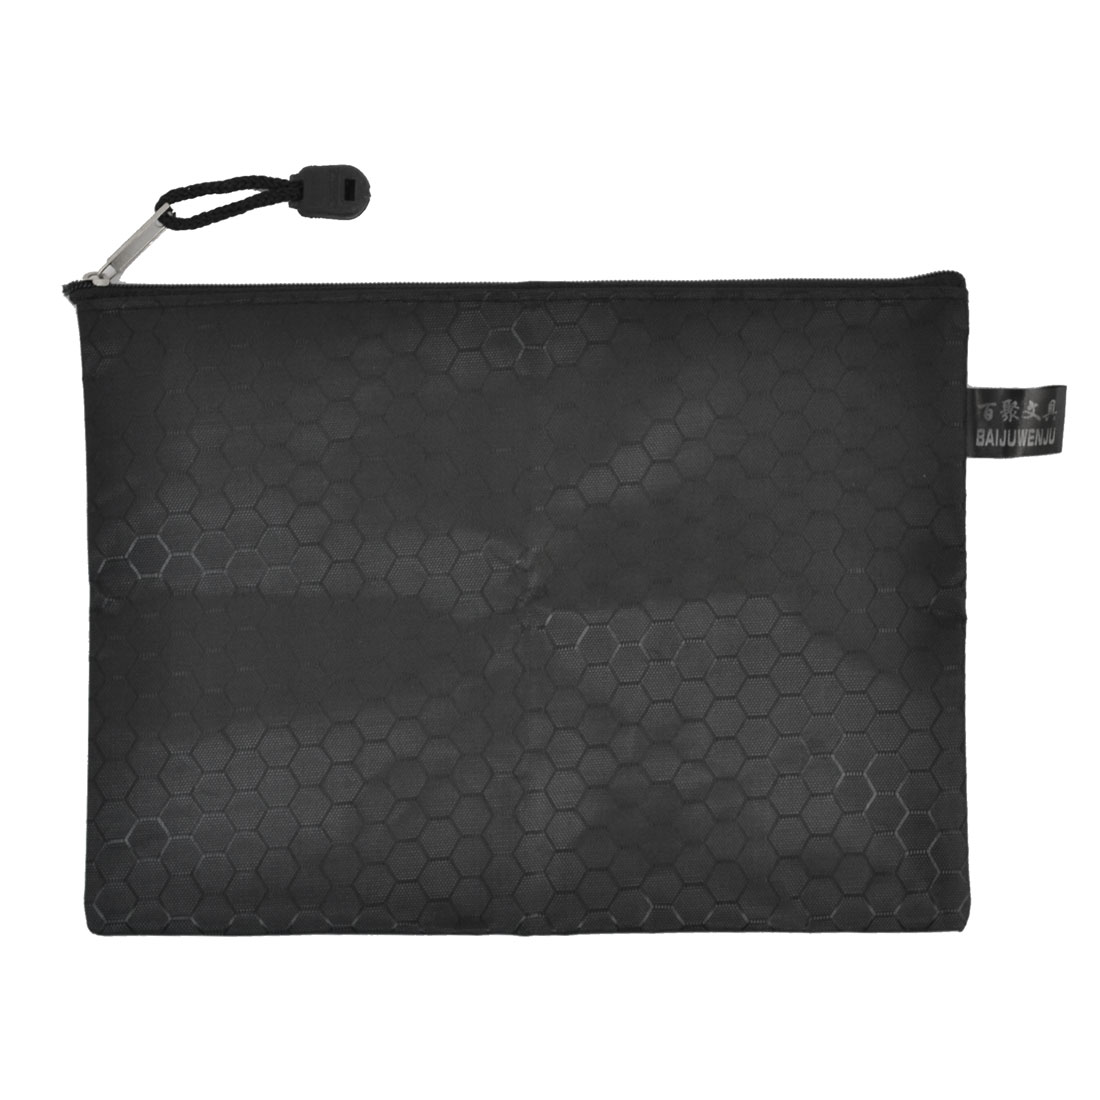 Portable Rectangle Black A5 File Paper Document Orangizer Zipper Storage Bag